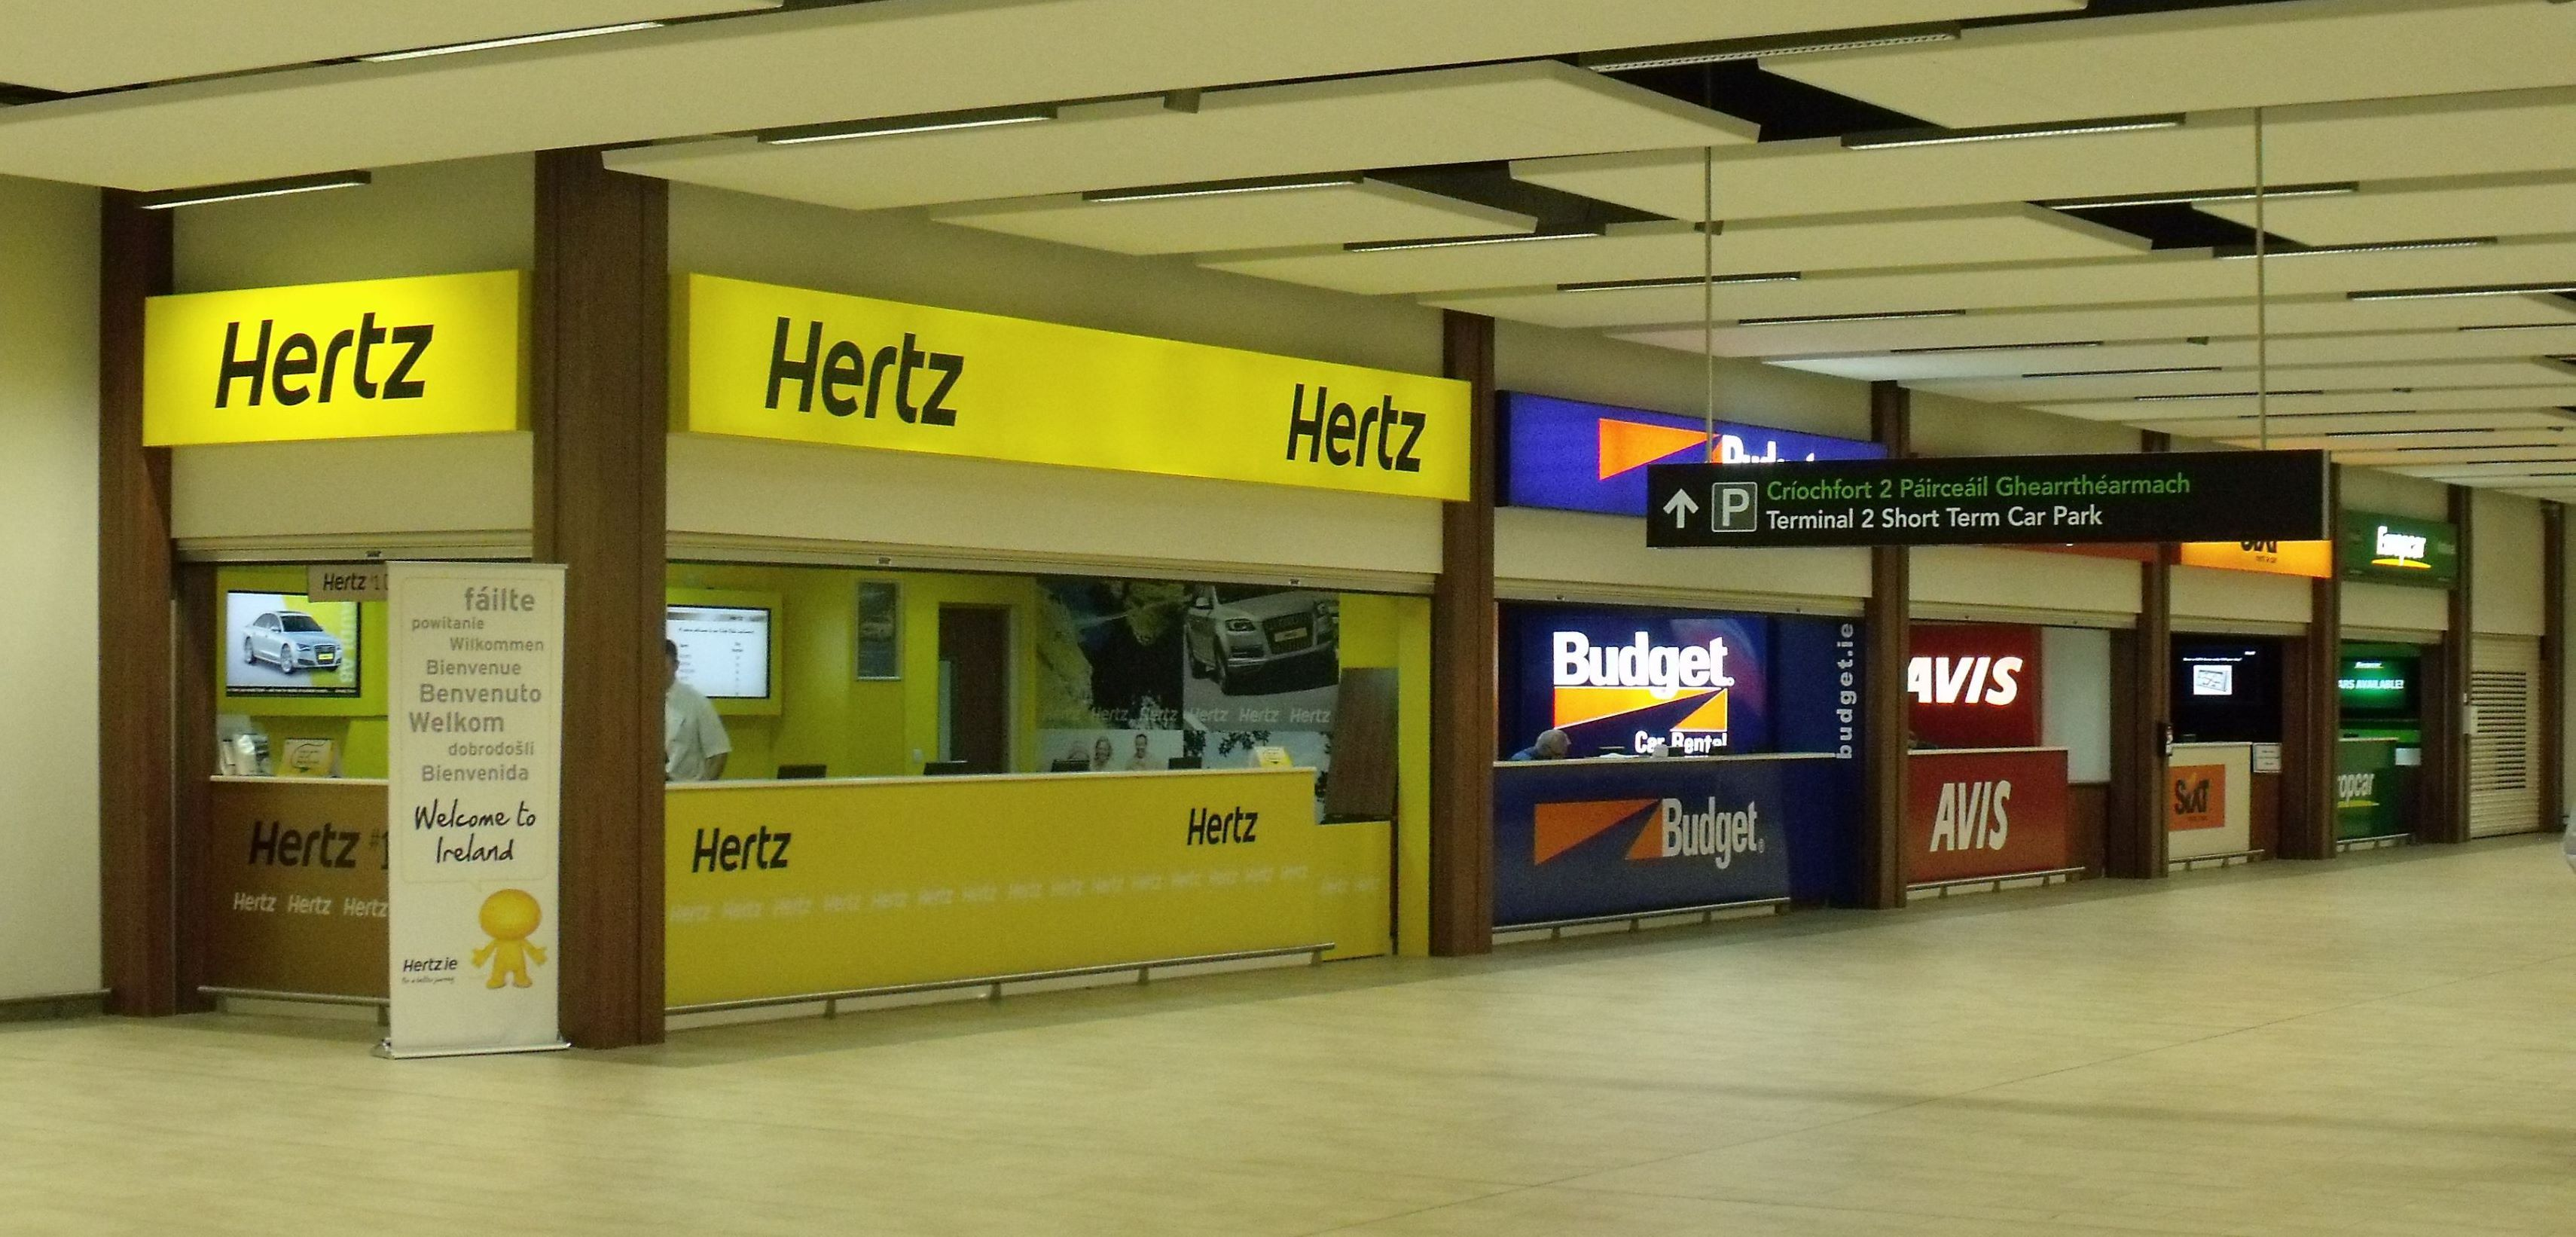 Car Desks Hertz Budget Avis Sixt And Europcar Desks At Dublin Airport